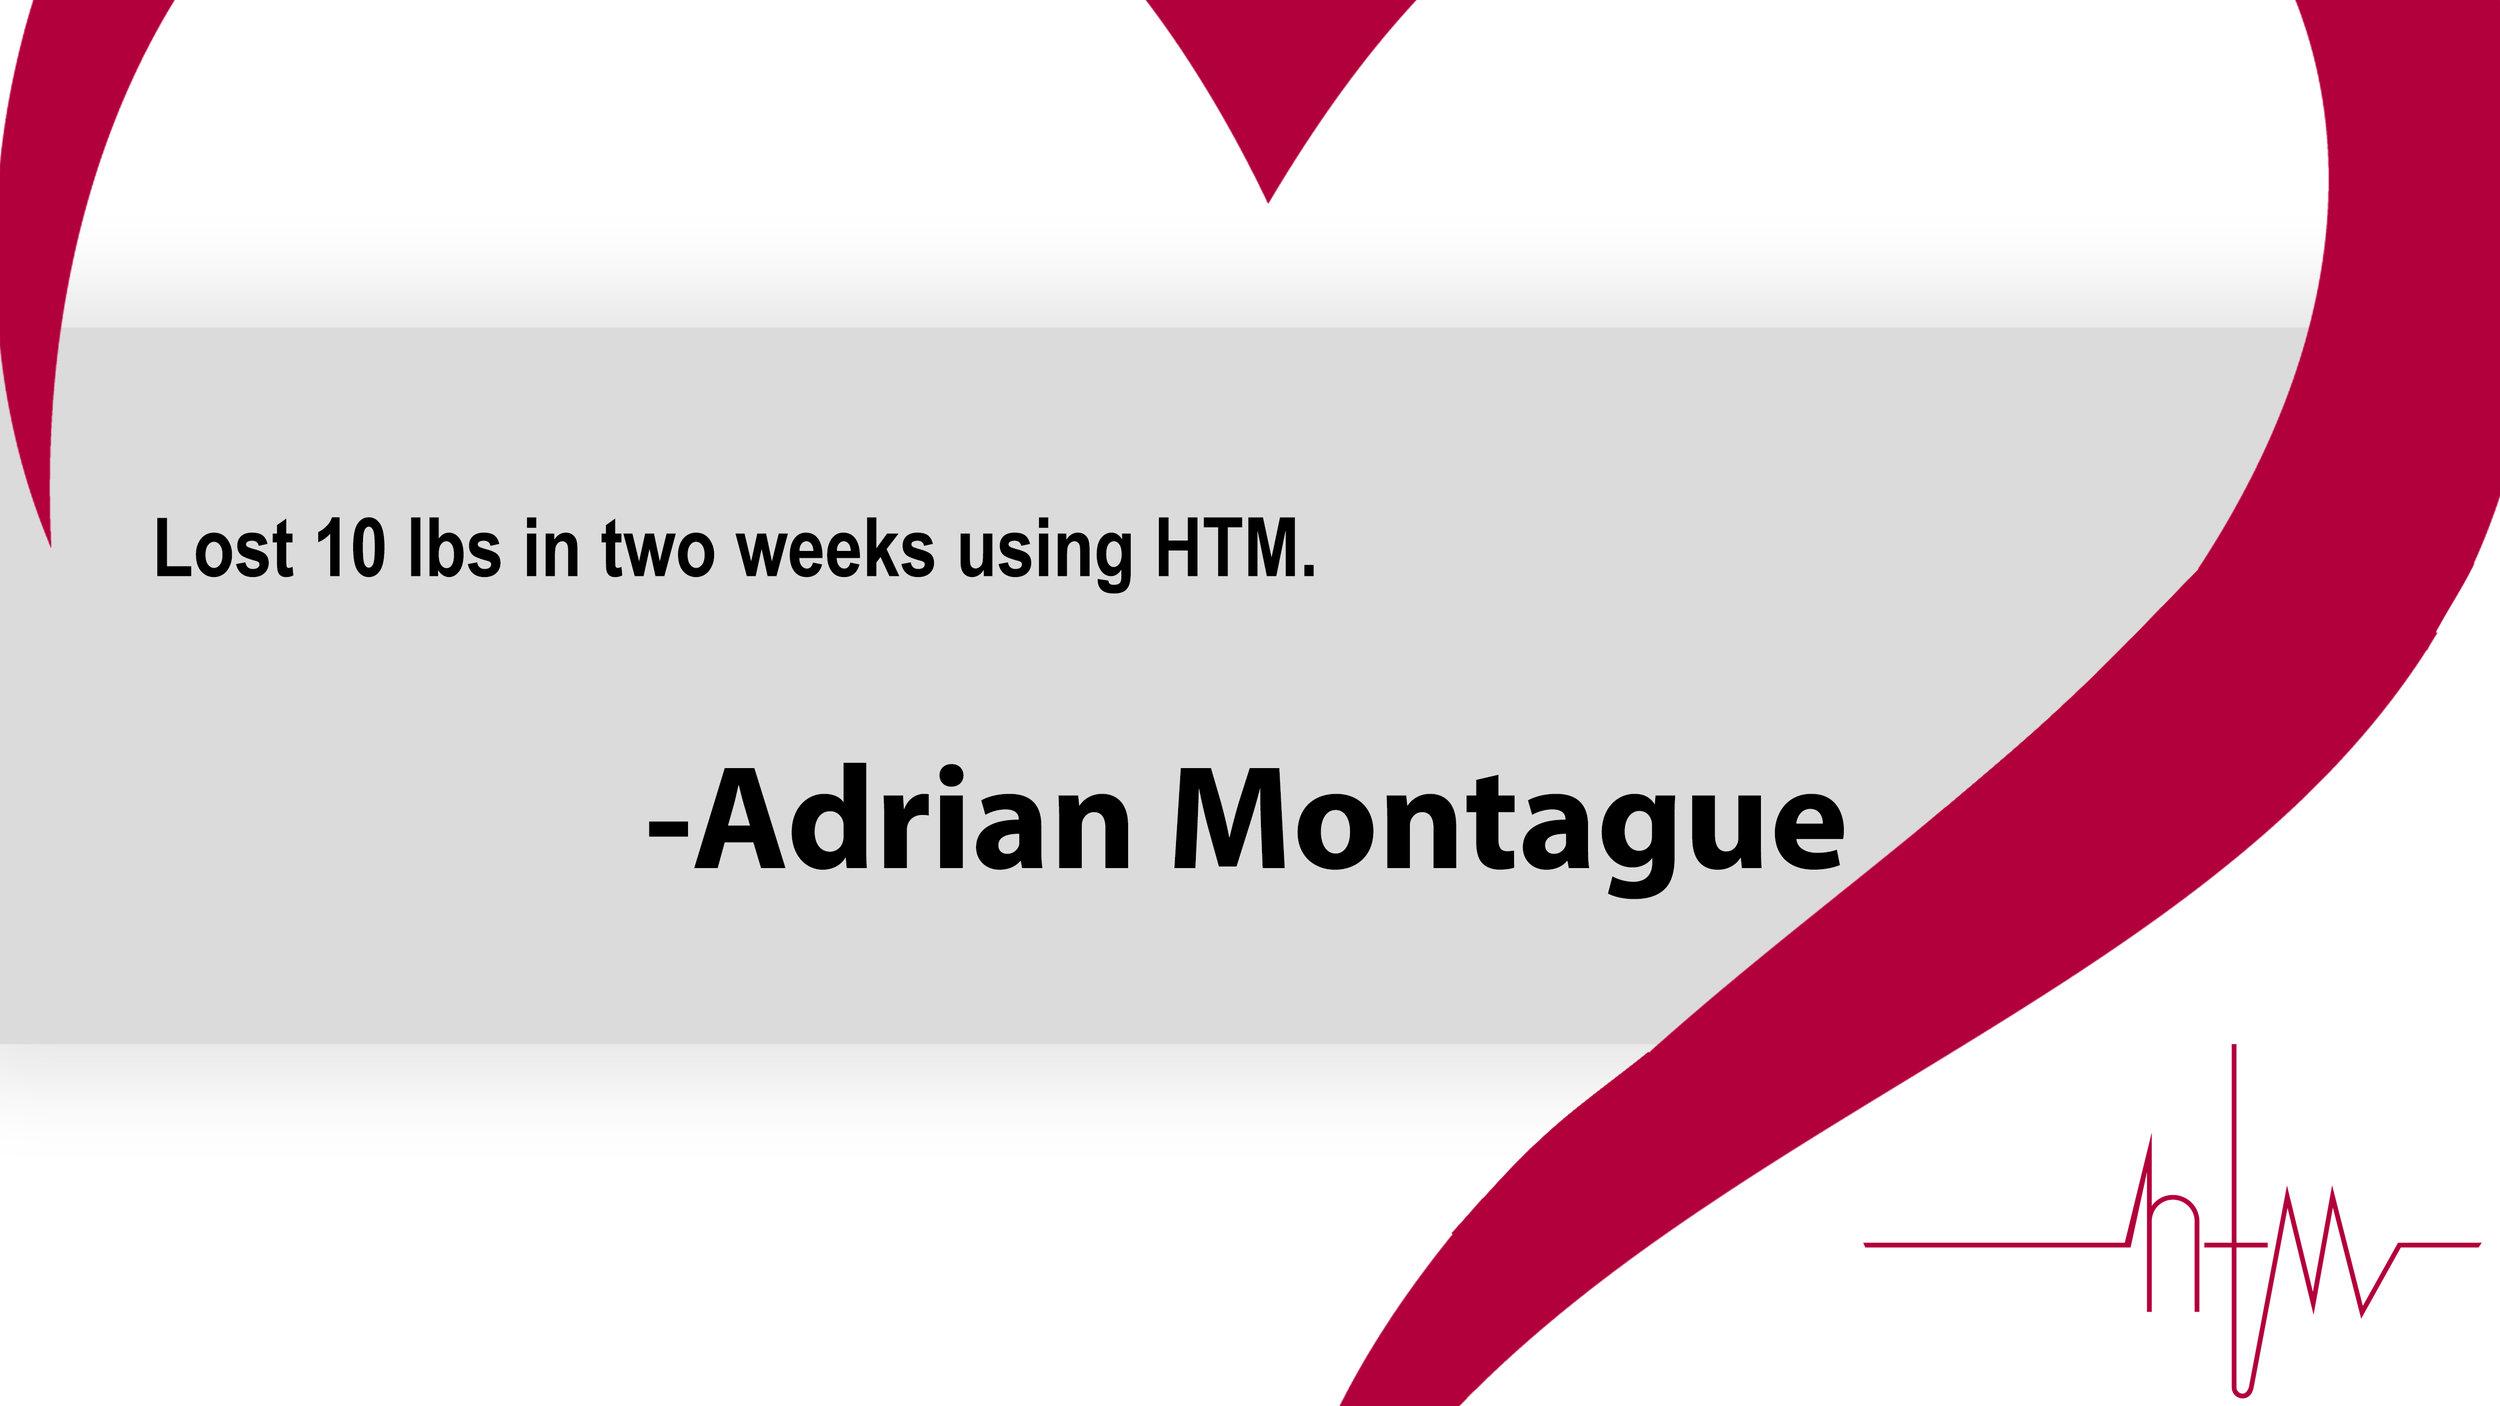 Adrian_Montague_Testimony.jpg